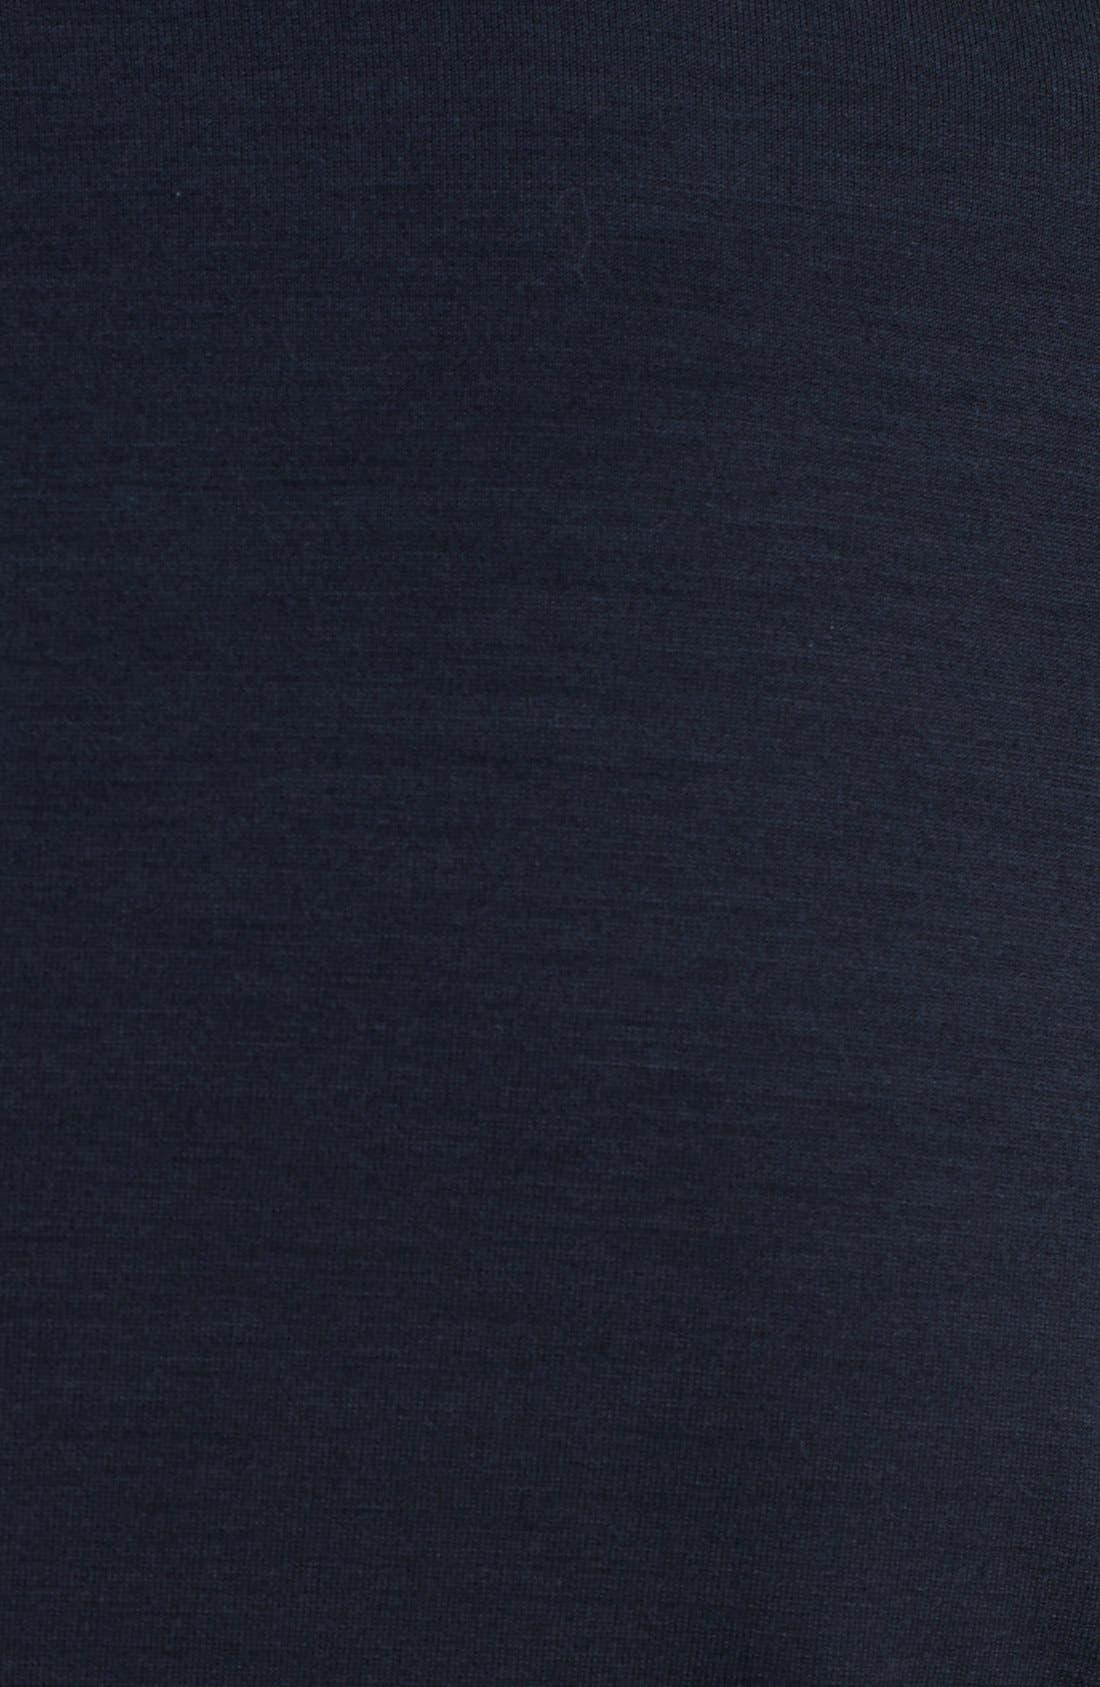 Alternate Image 3  - Max Mara 'Circe' Jersey Tee